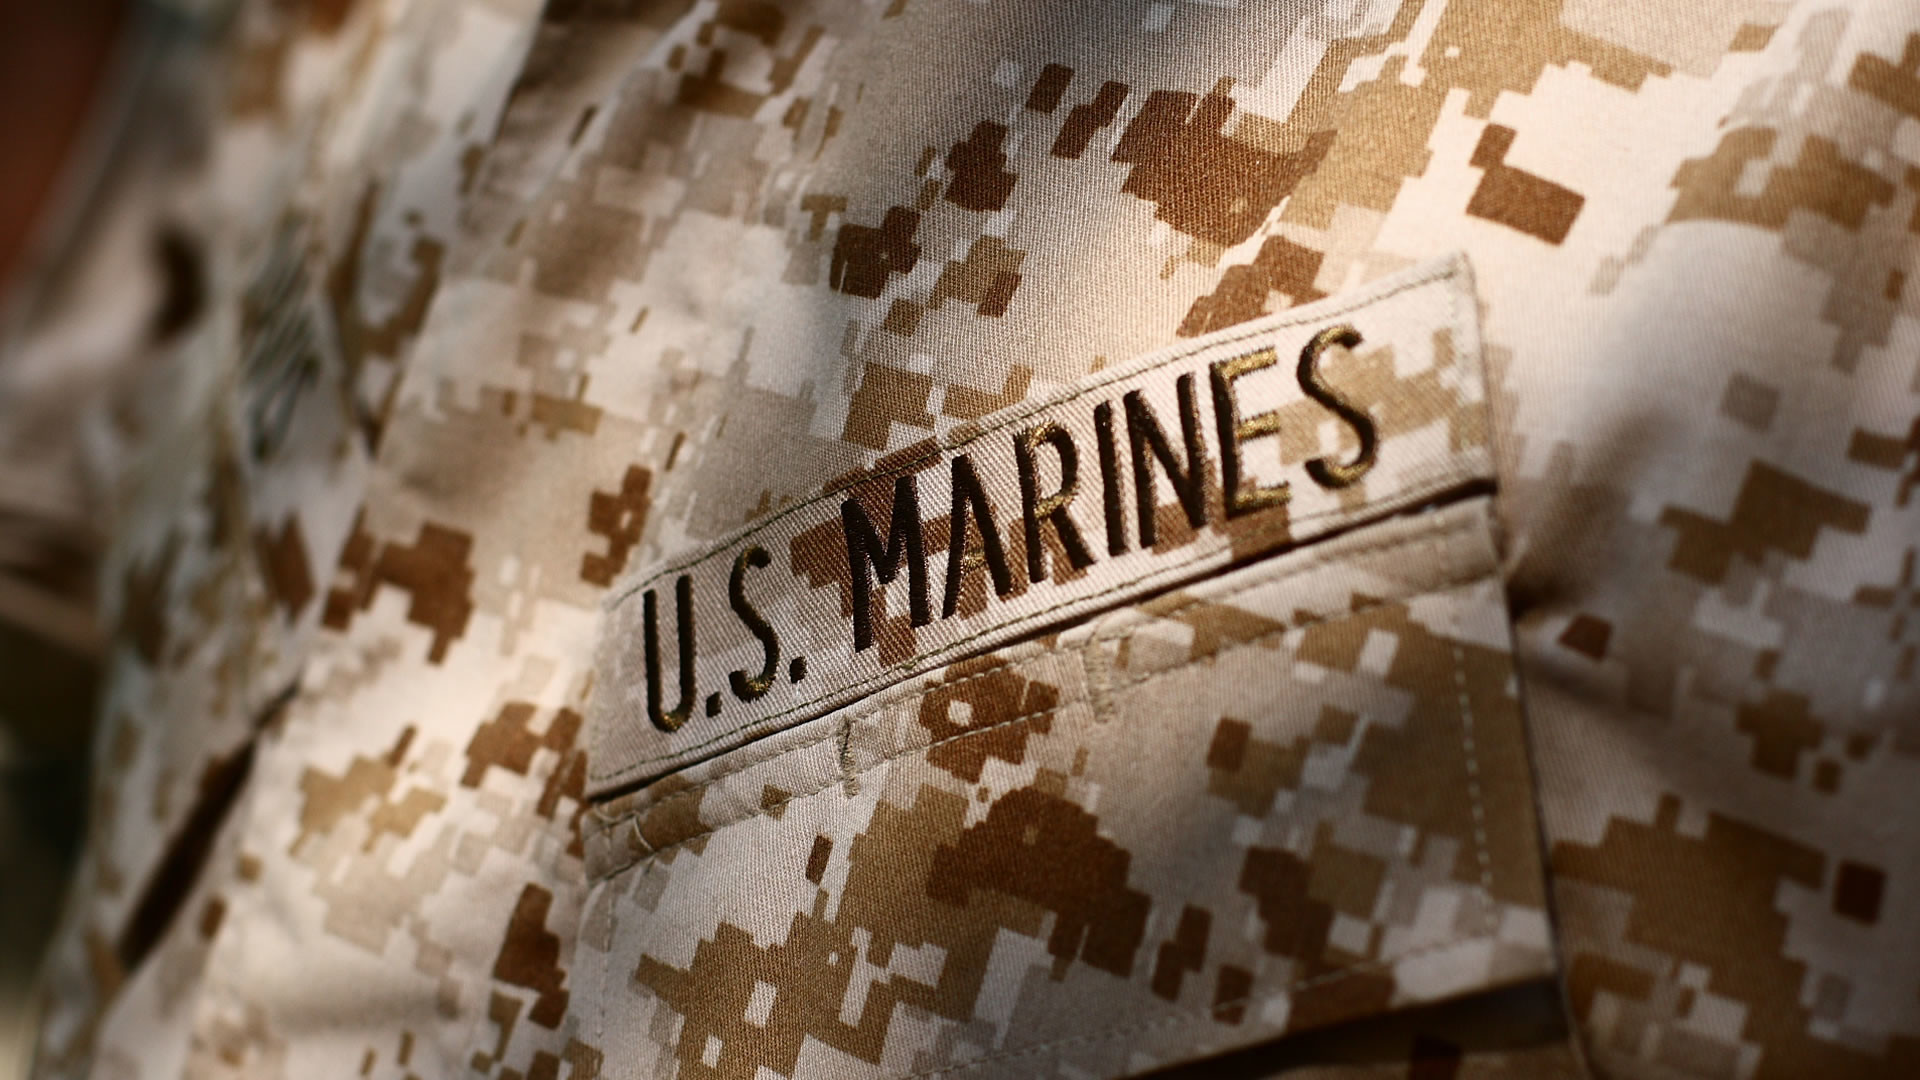 US Marines Uniform Pat… …